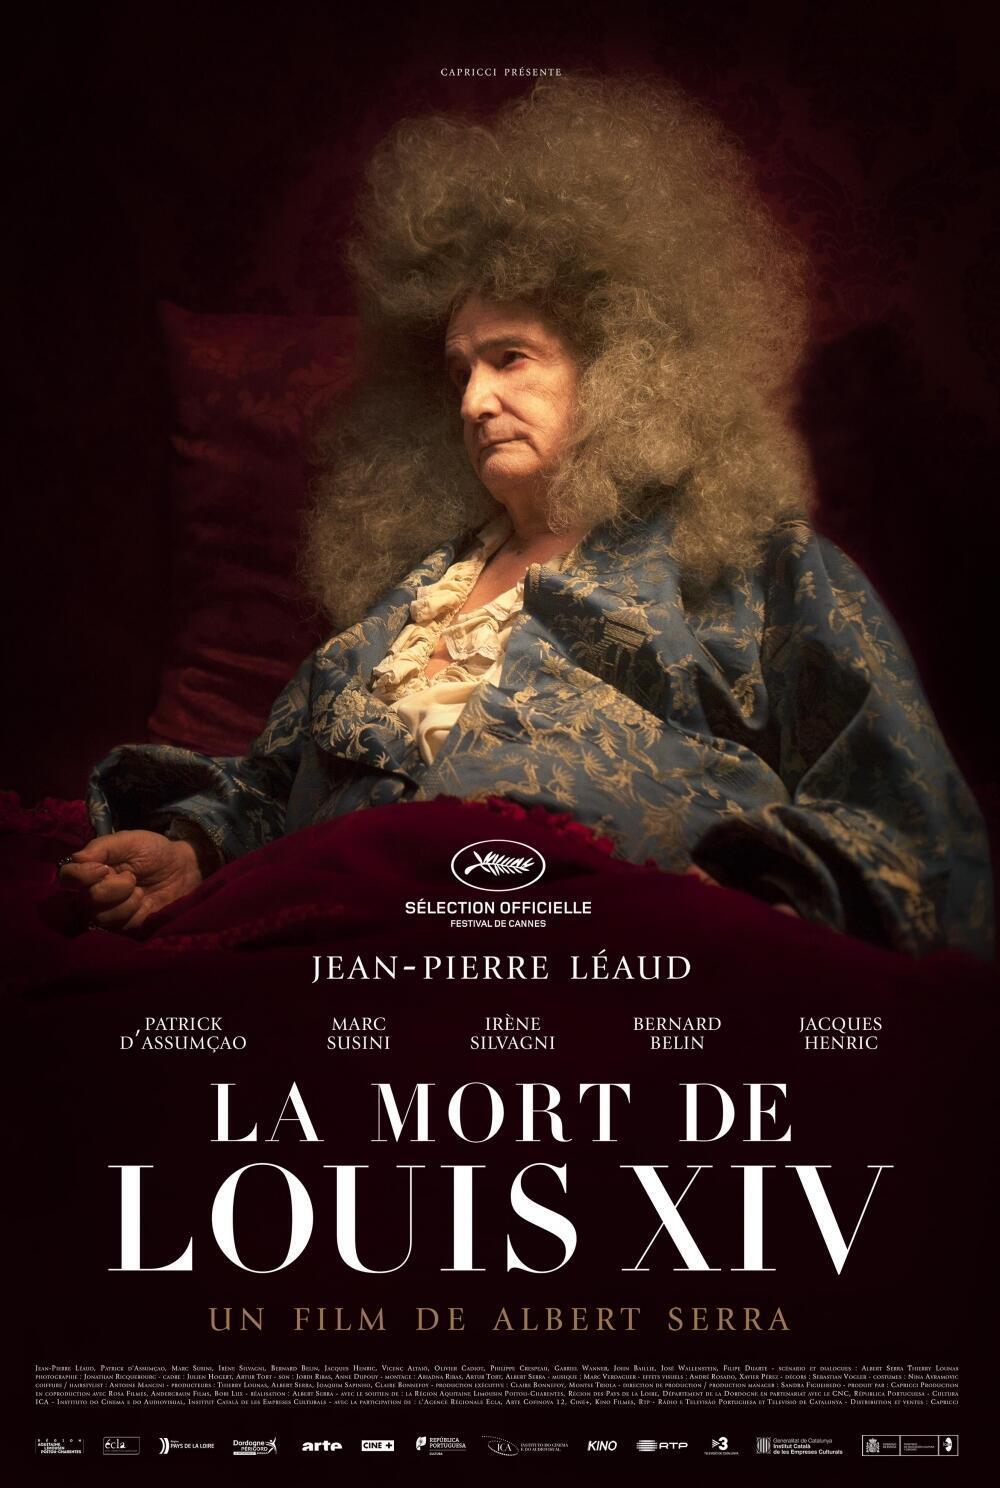 Affiche de <i>La mort de Louis XIV, </i>du cinéaste catalan Albert Serra.